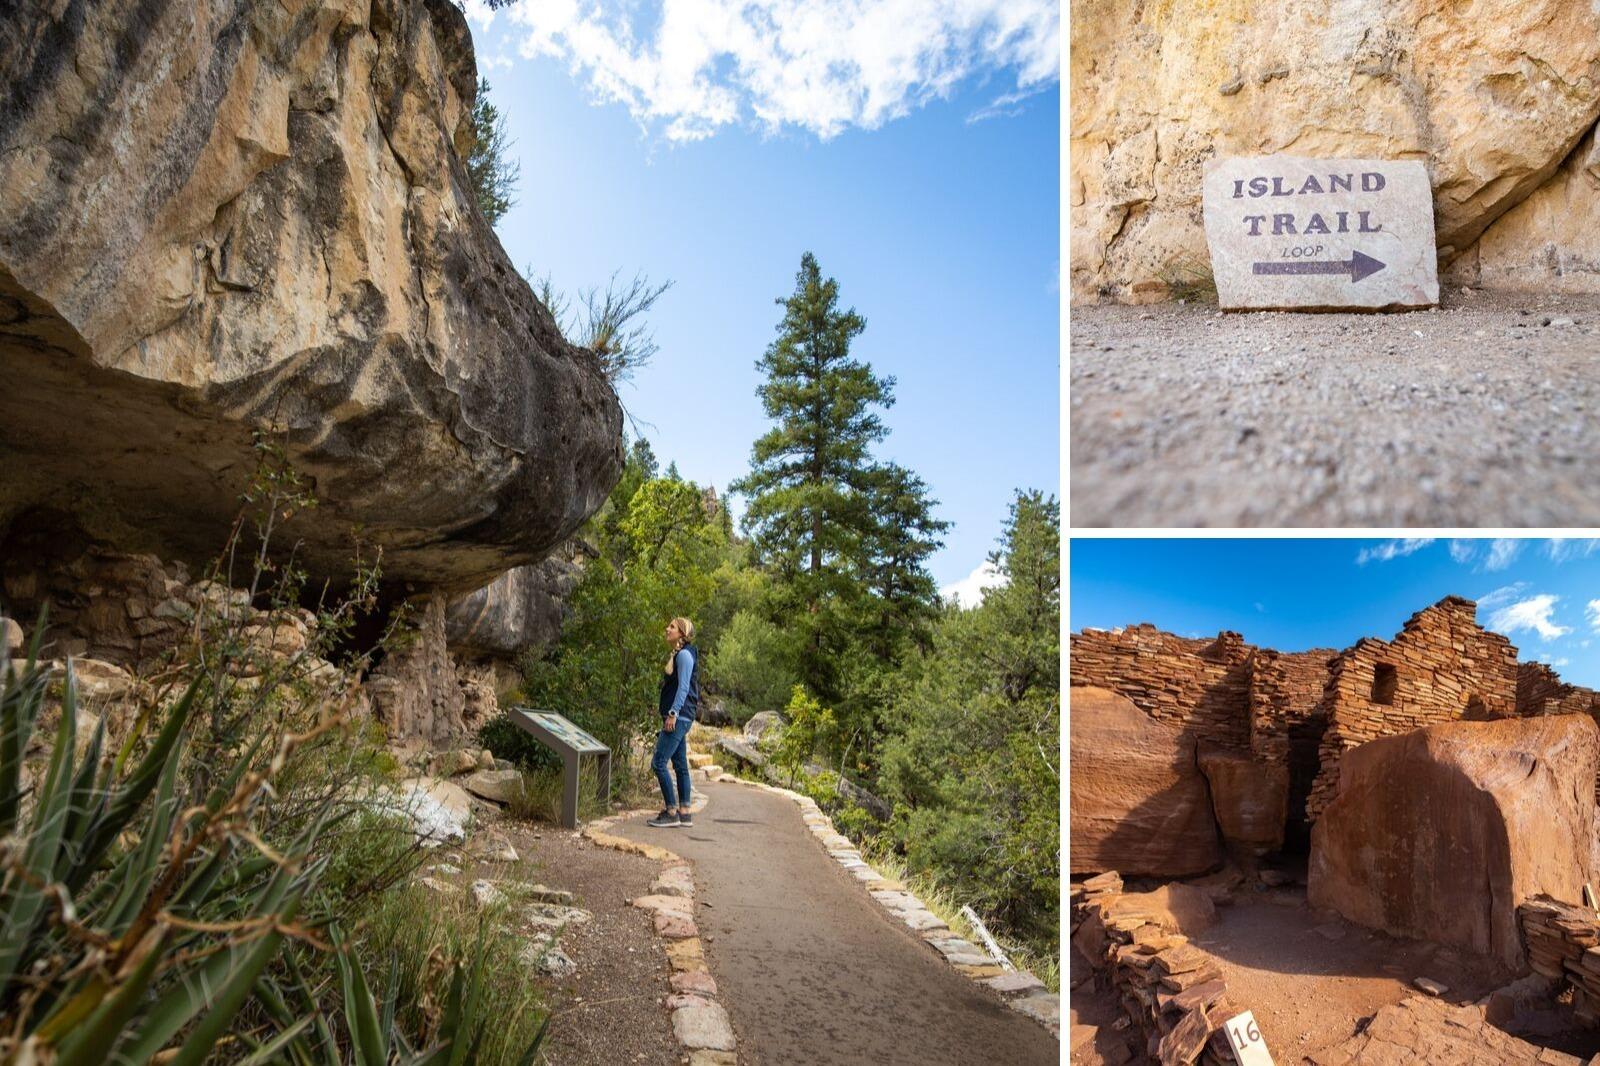 Flagstaff, Arizona is the City of Seven Wonders